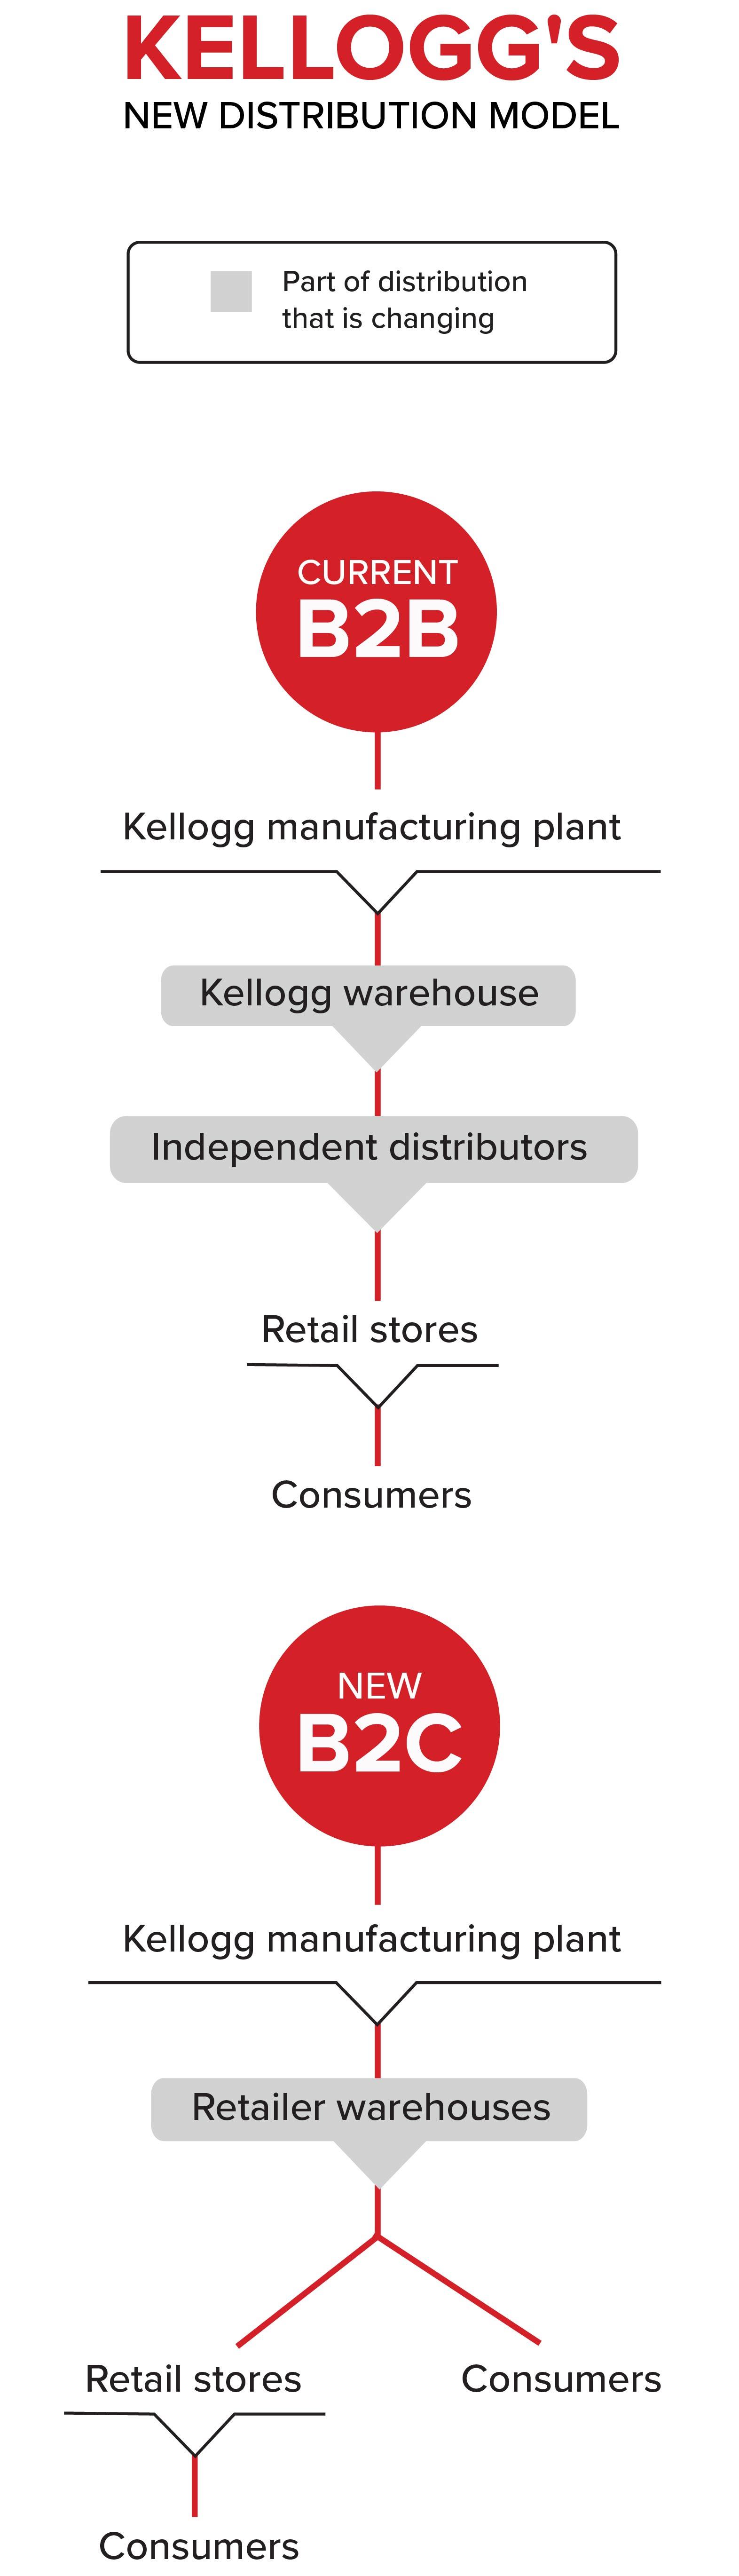 Kellogg's Distribution Model DSD to Warehouse